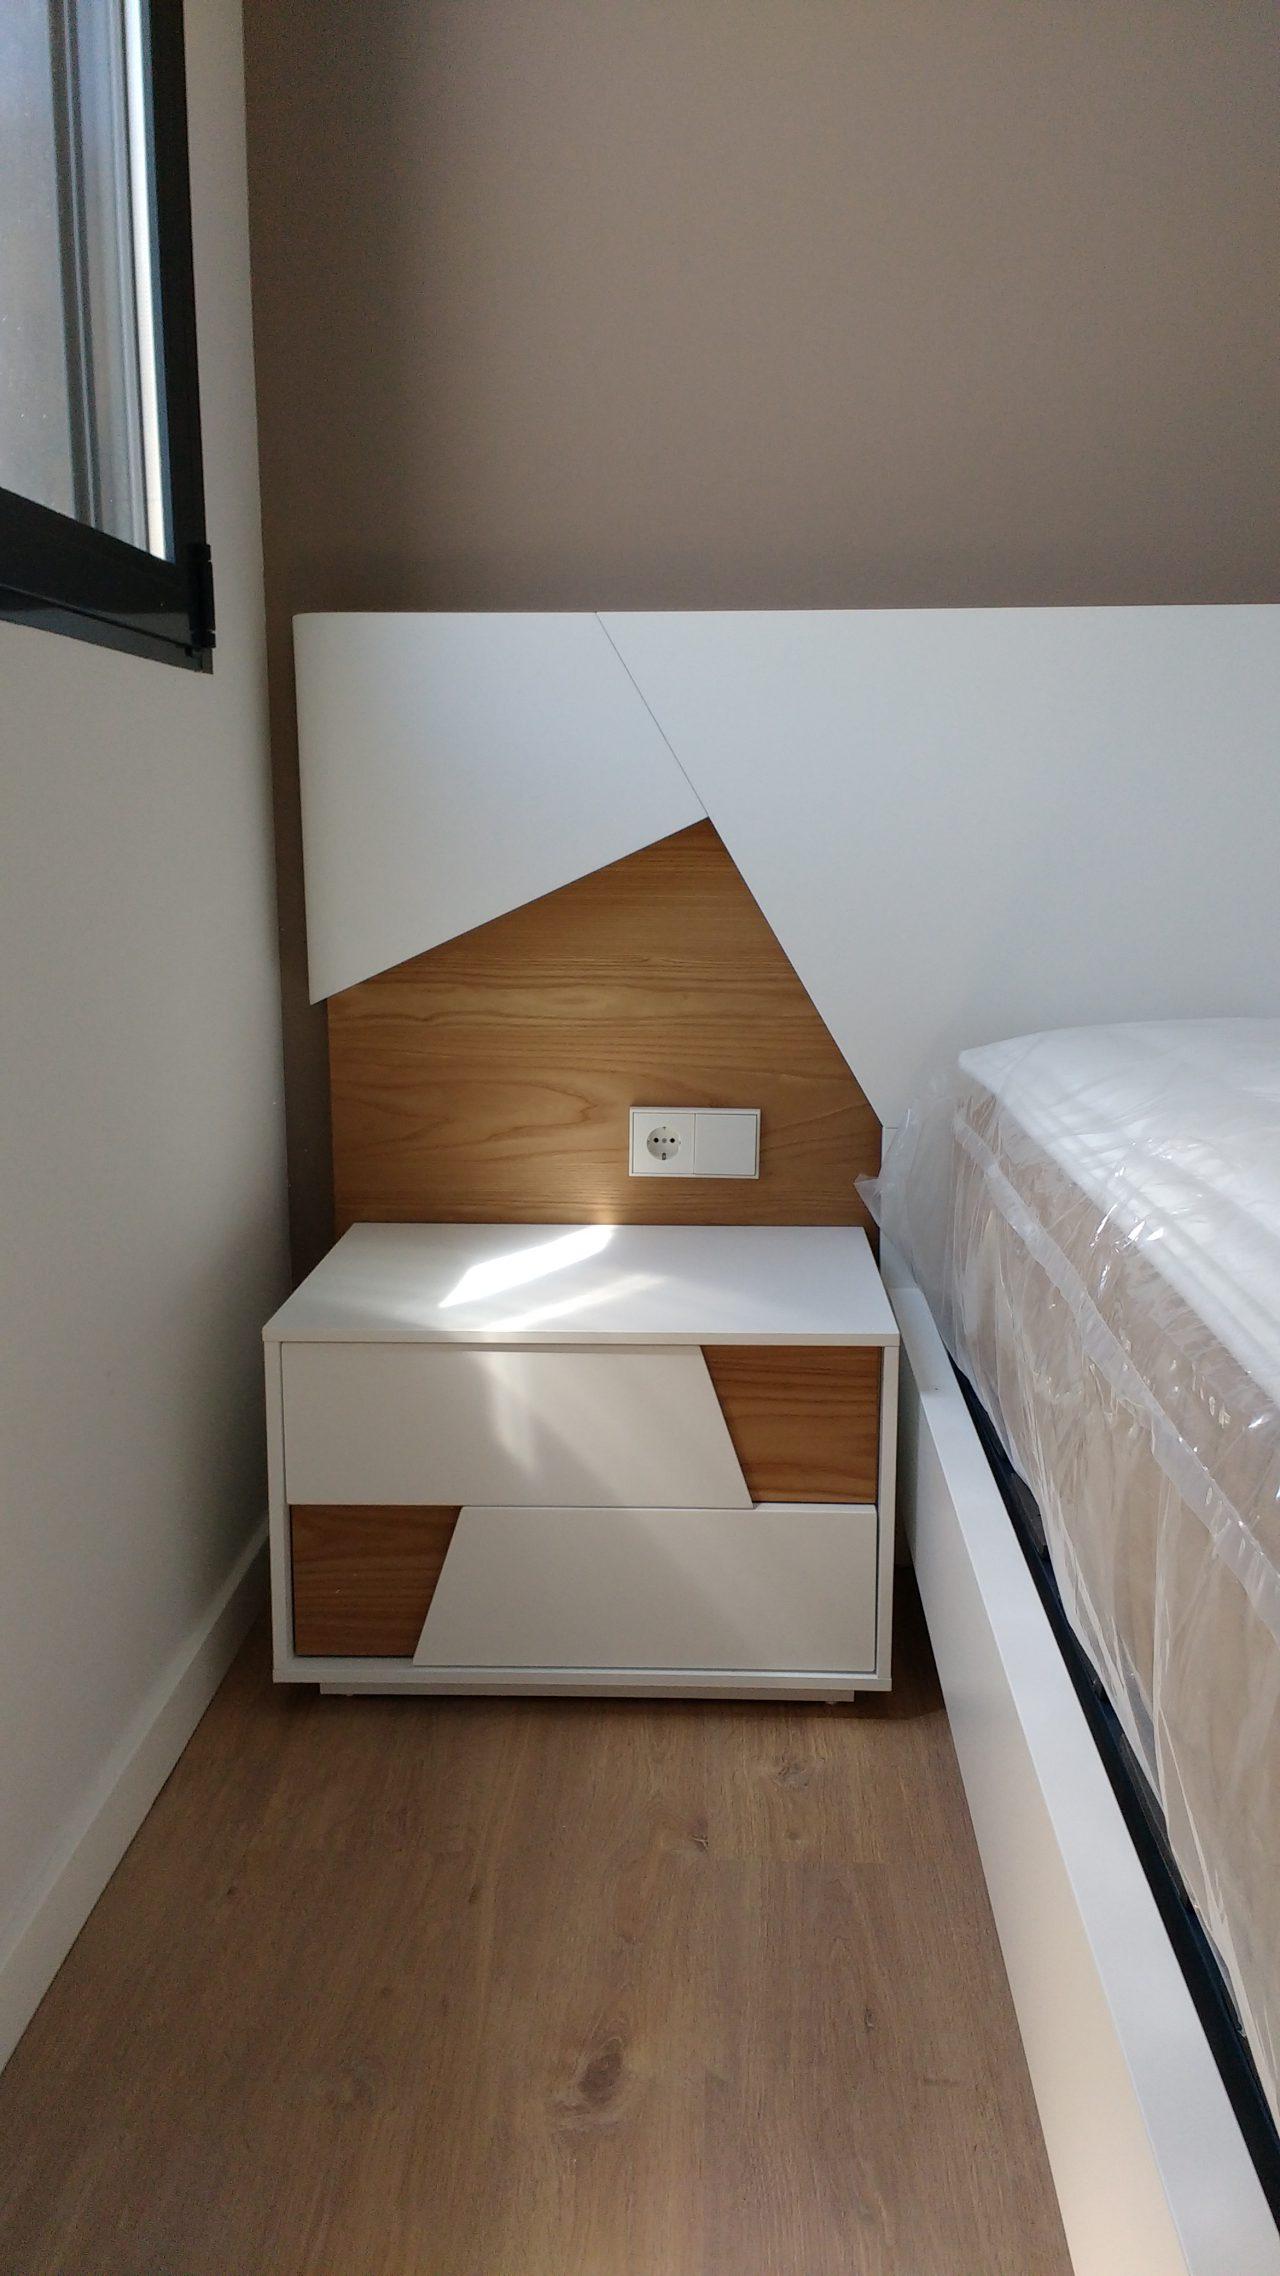 Dormitorio Principal detalle mesilla